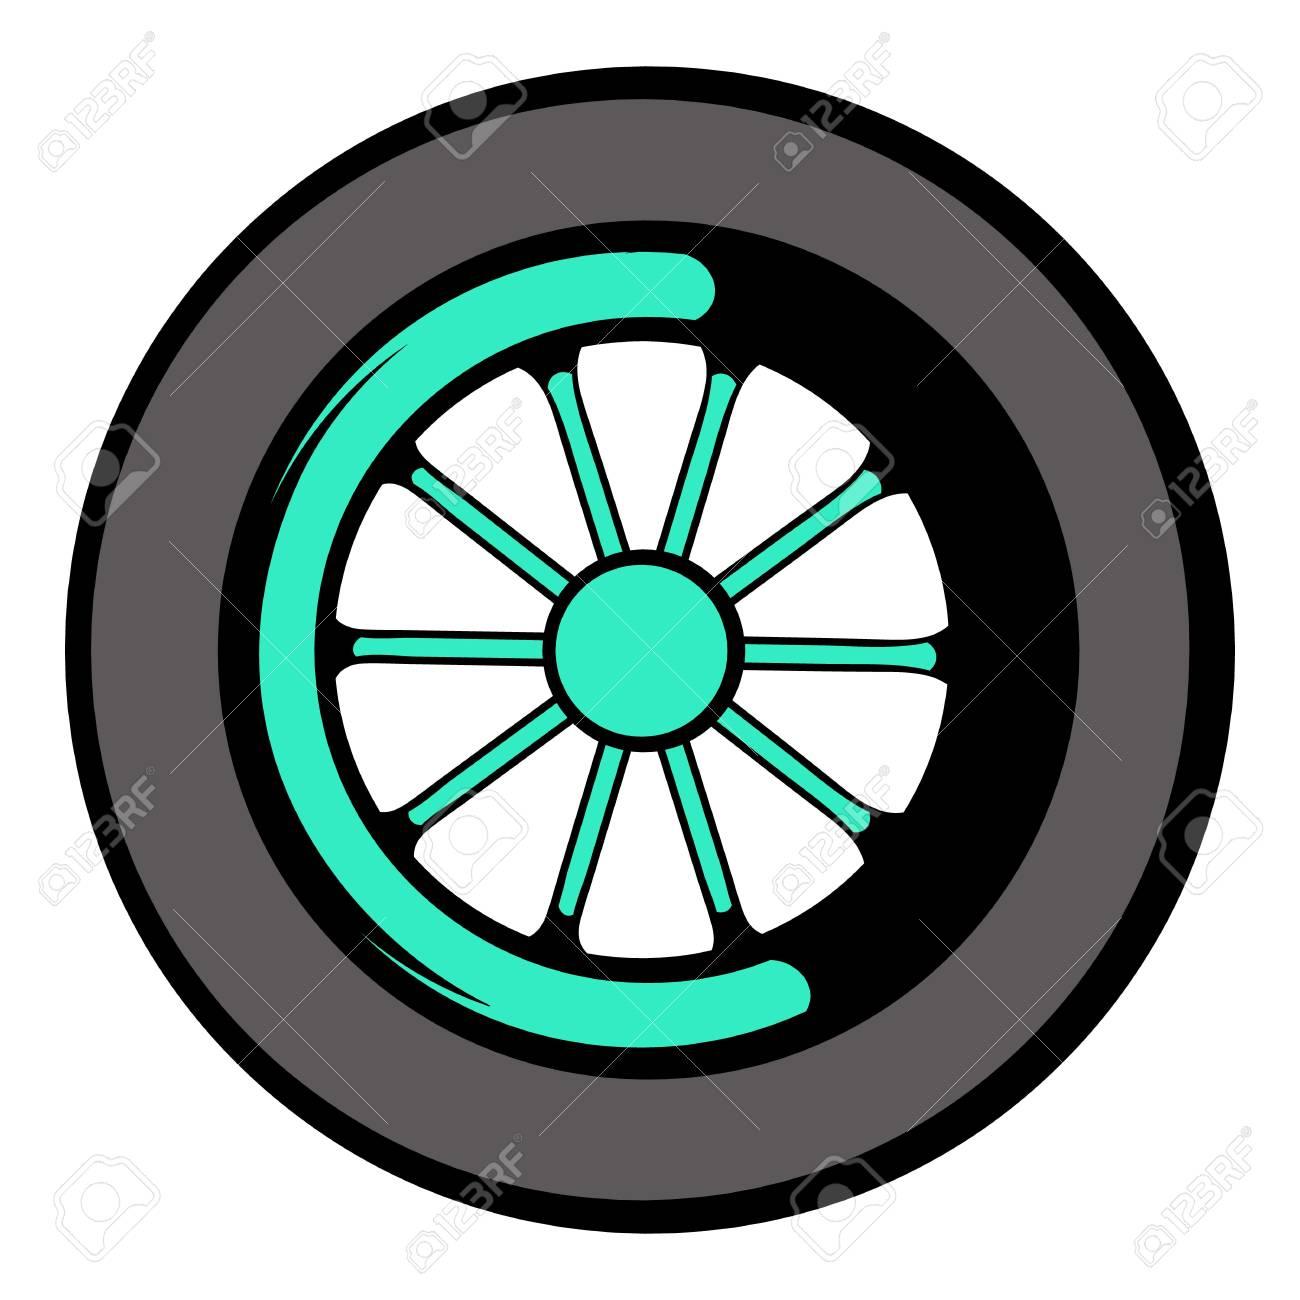 Car Wheel Icon Icon Cartoon Royalty Free Cliparts Vectors And Stock Illustration Image 74004348